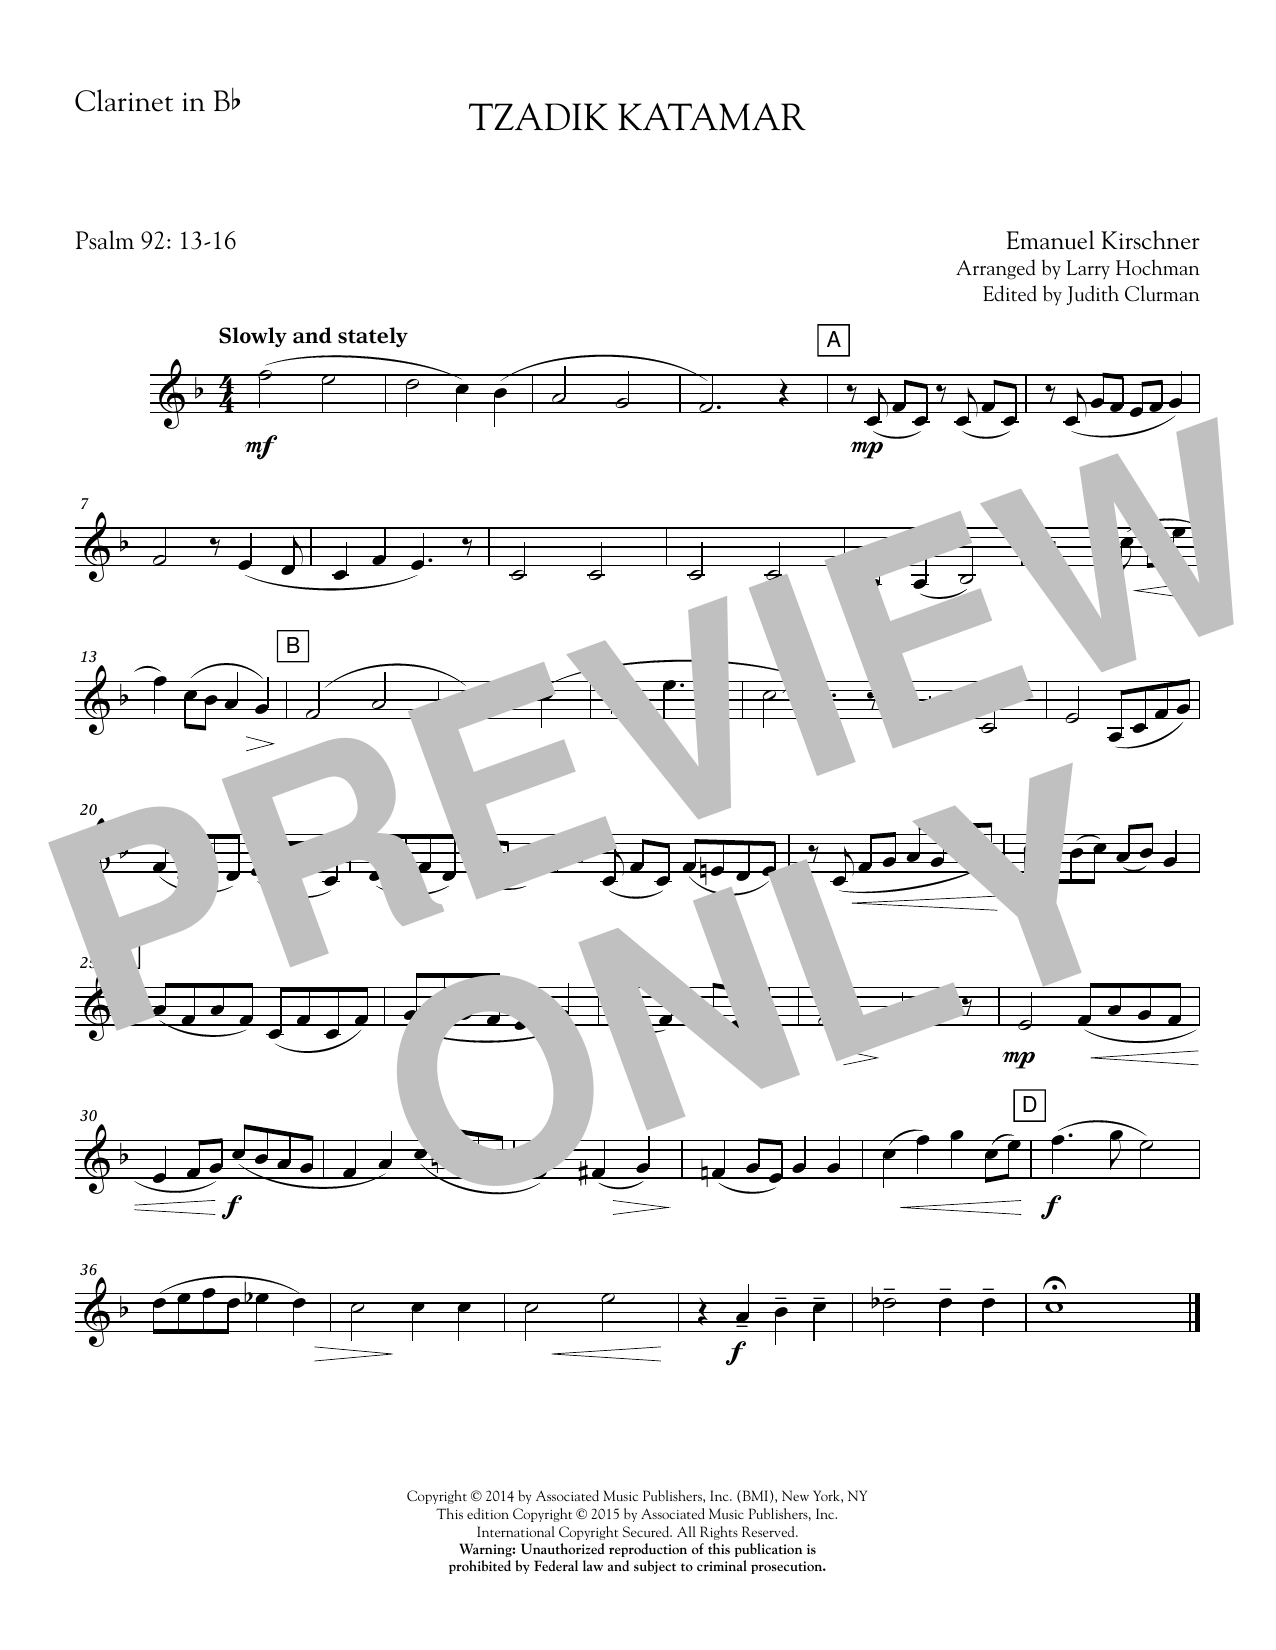 Emanuil Kirschner - Tzadik Katamar - Clarinet